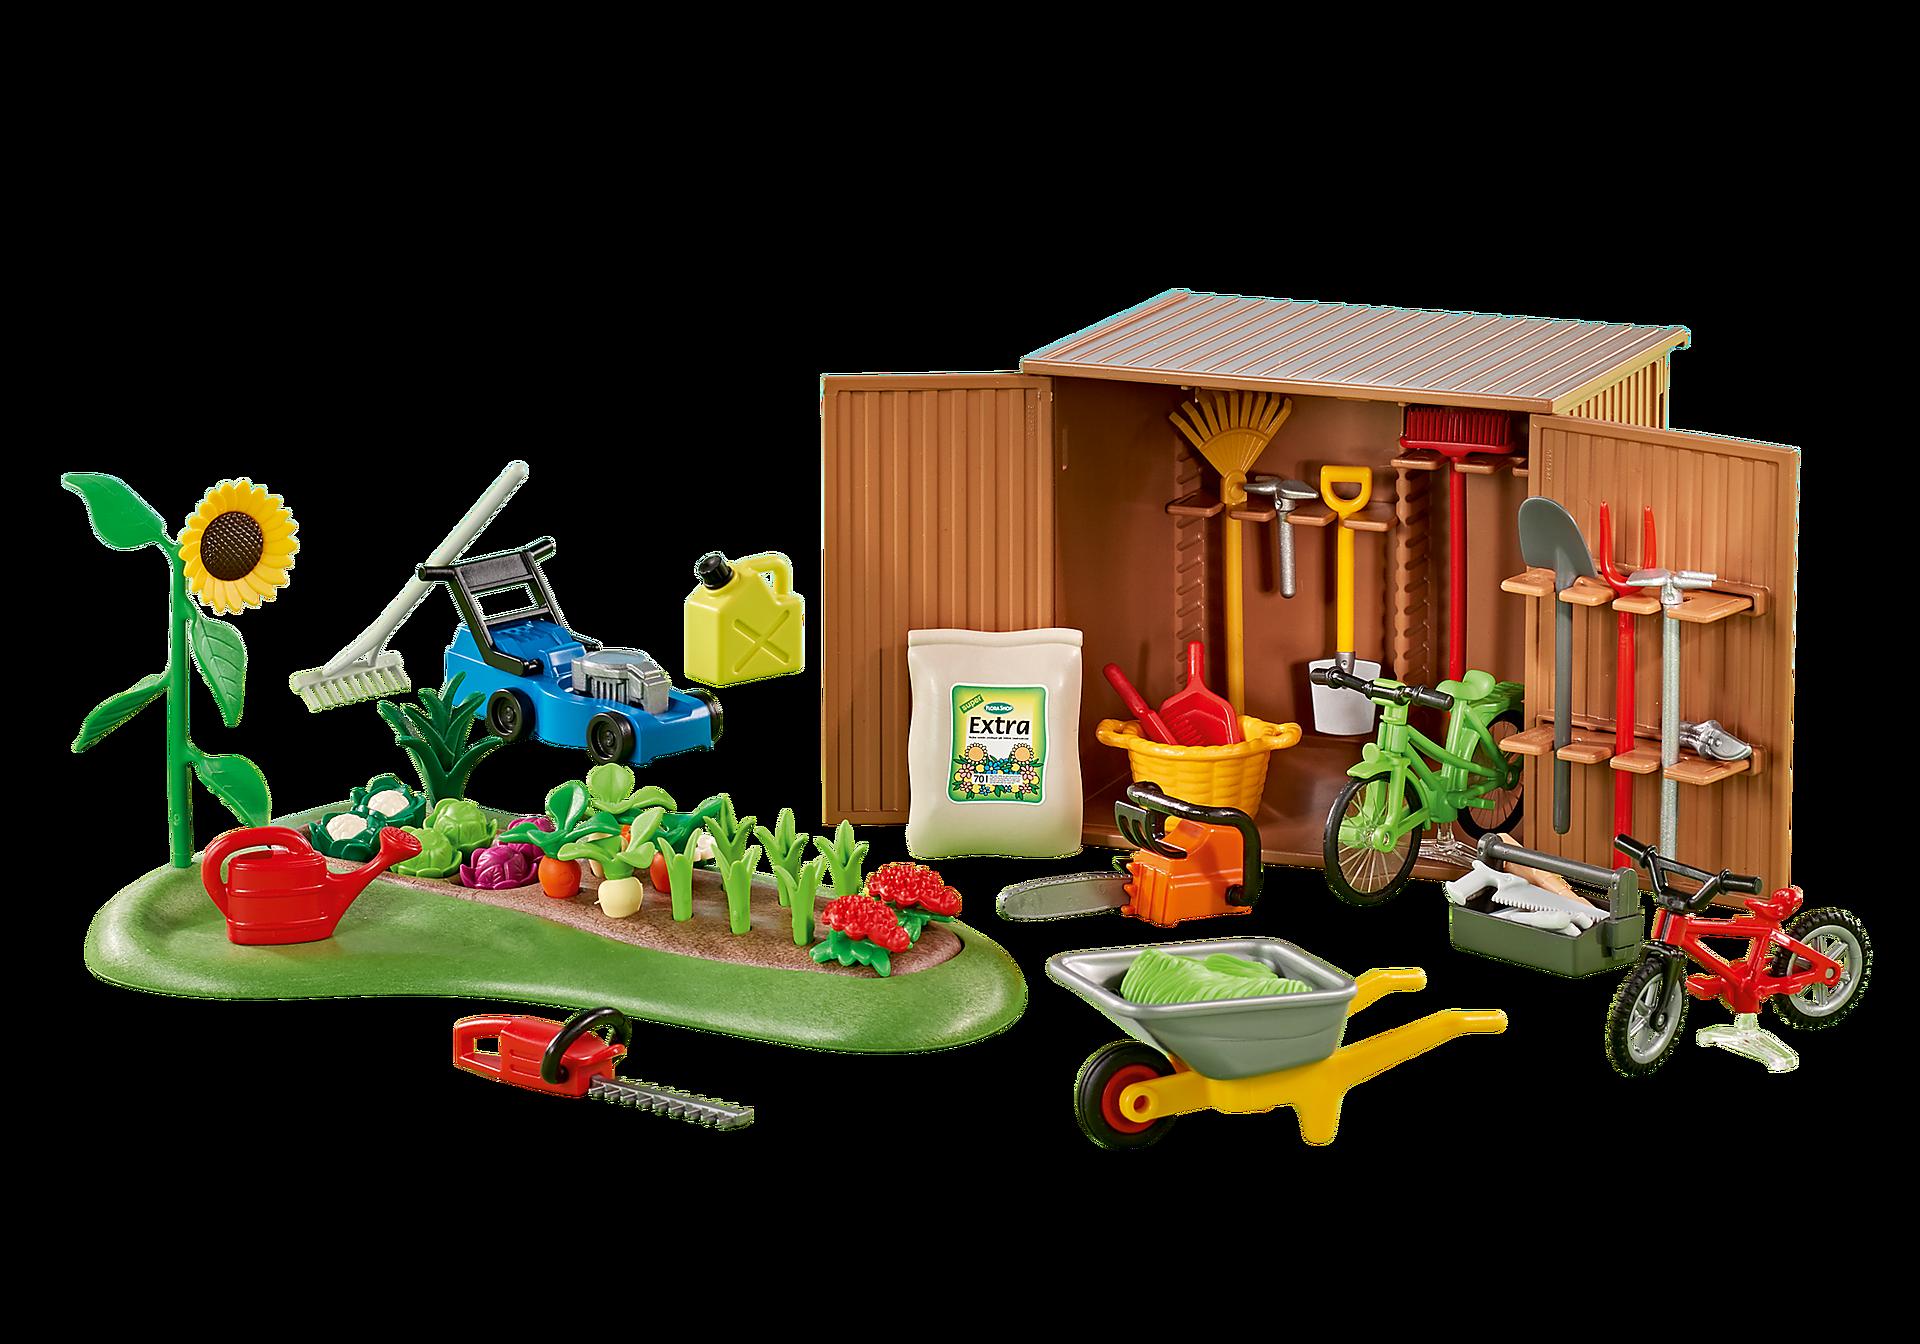 http://media.playmobil.com/i/playmobil/6558_product_detail/Capanno degli attrezzi con orto